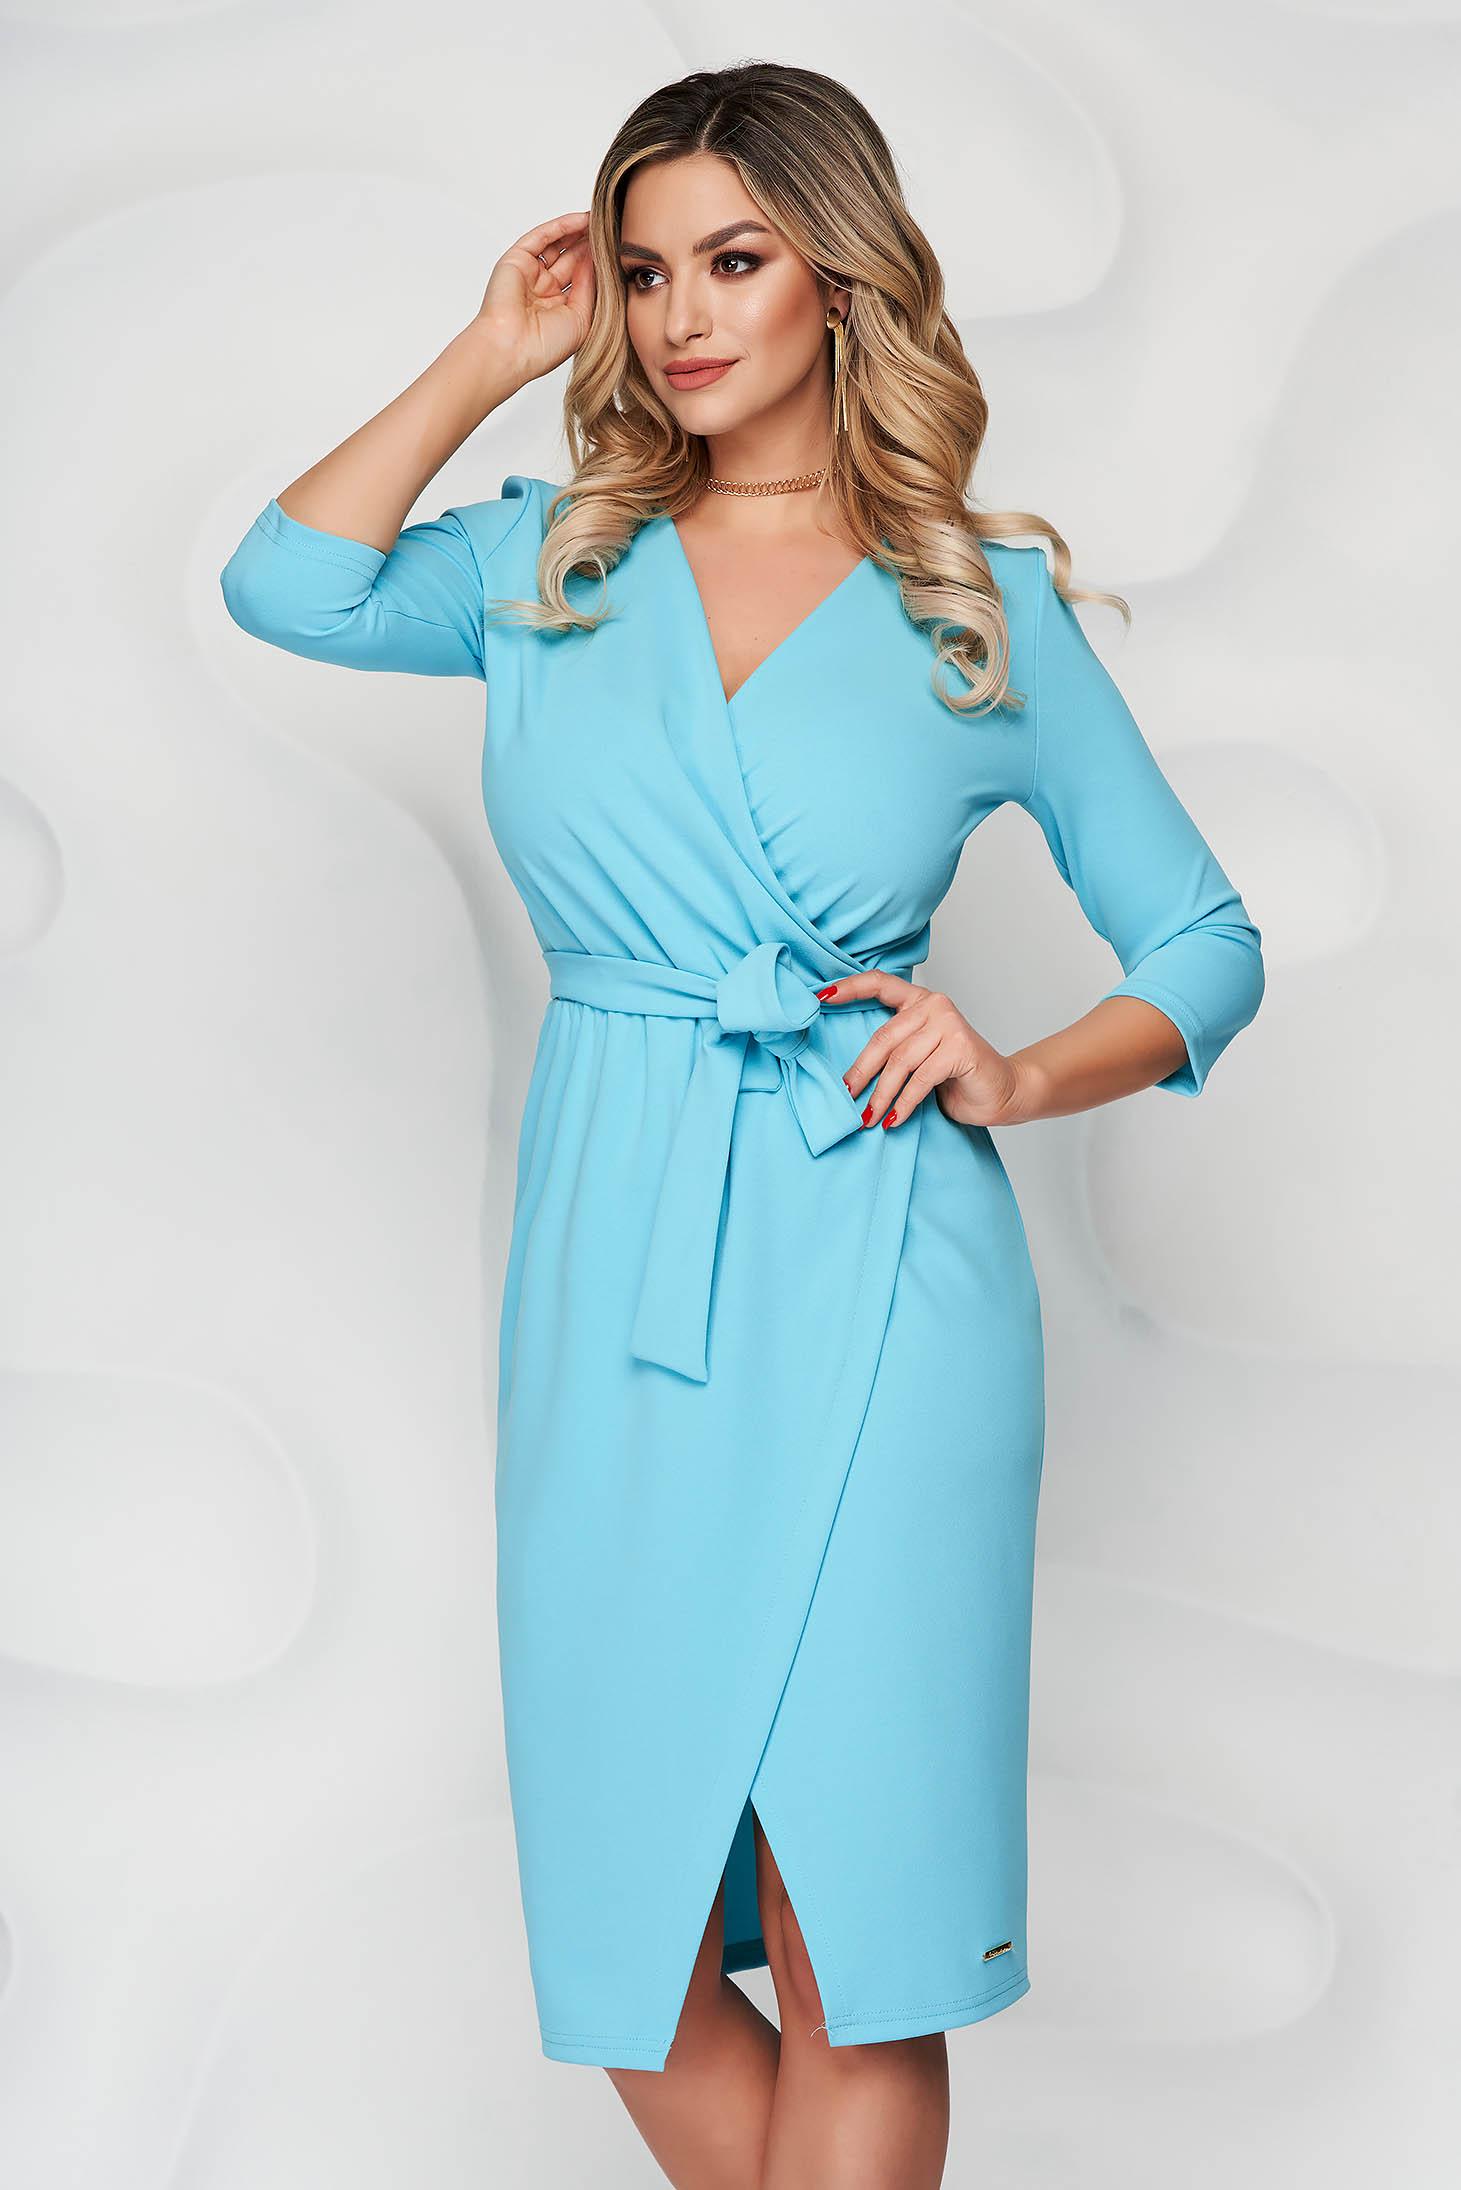 Rochie albastra office tip creion din material elastic cu decolteu petrecut